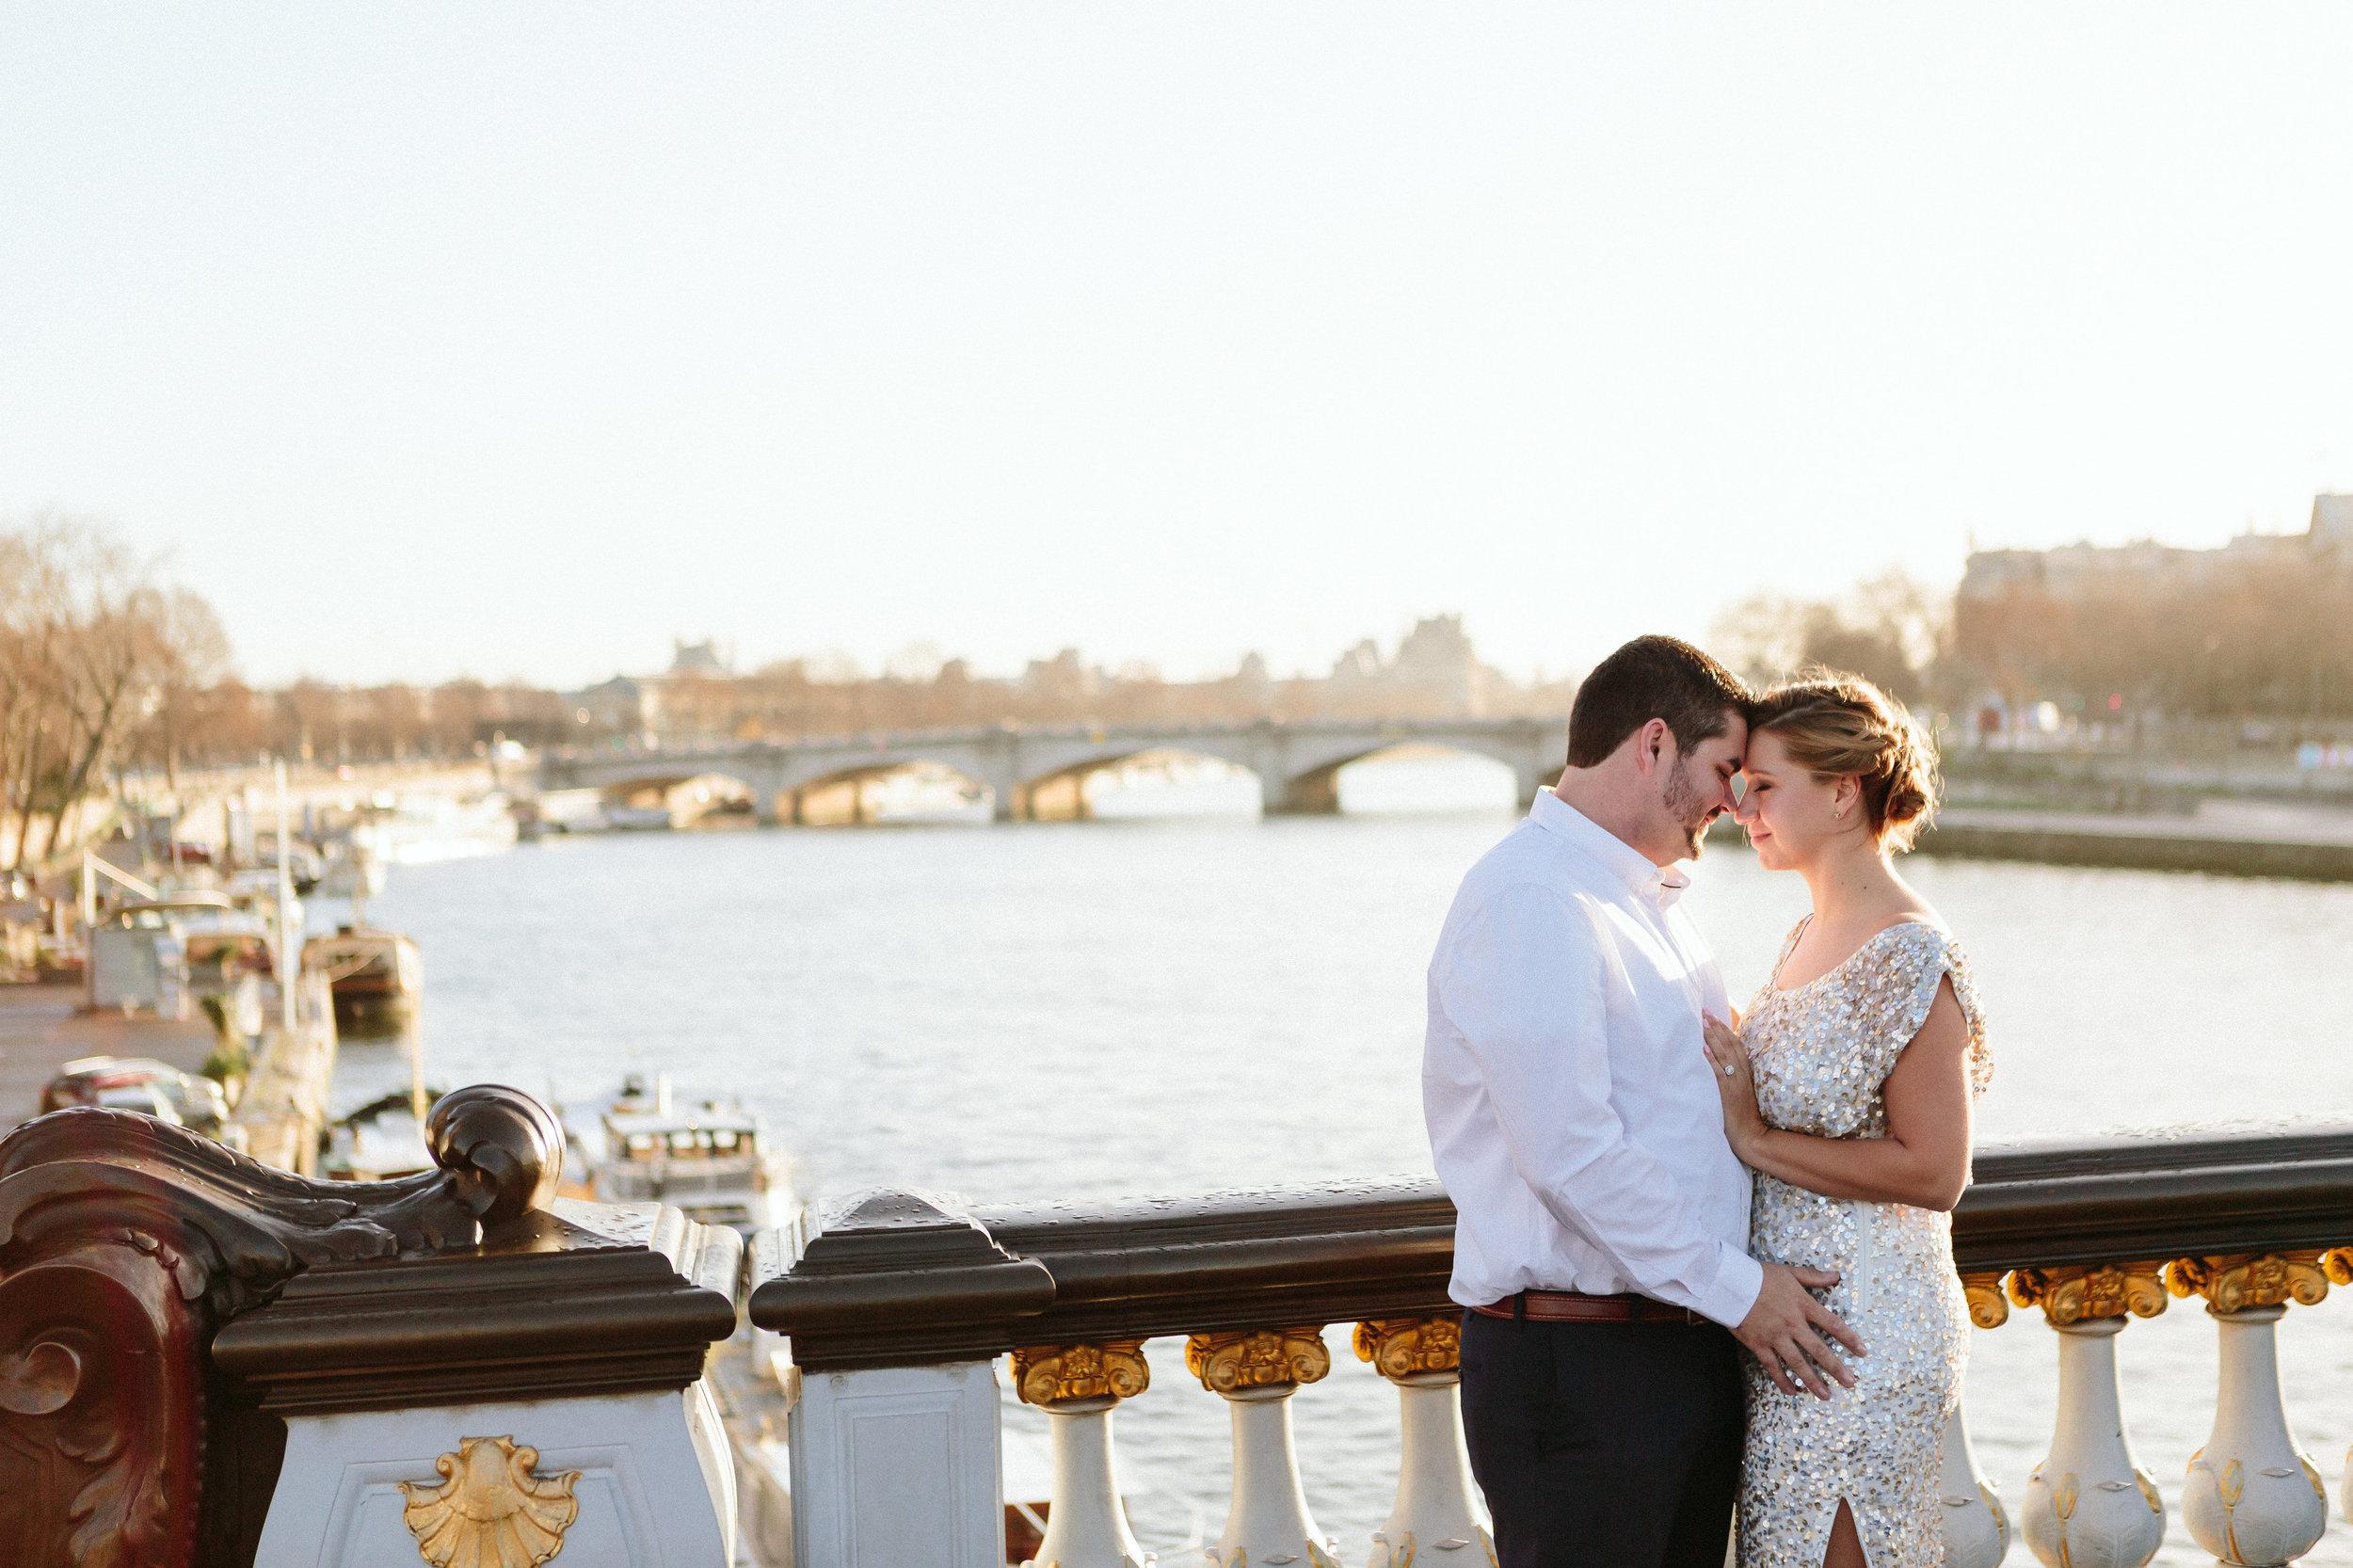 paris photographer federico guendel romantic couple portrait on alexandre III bridge